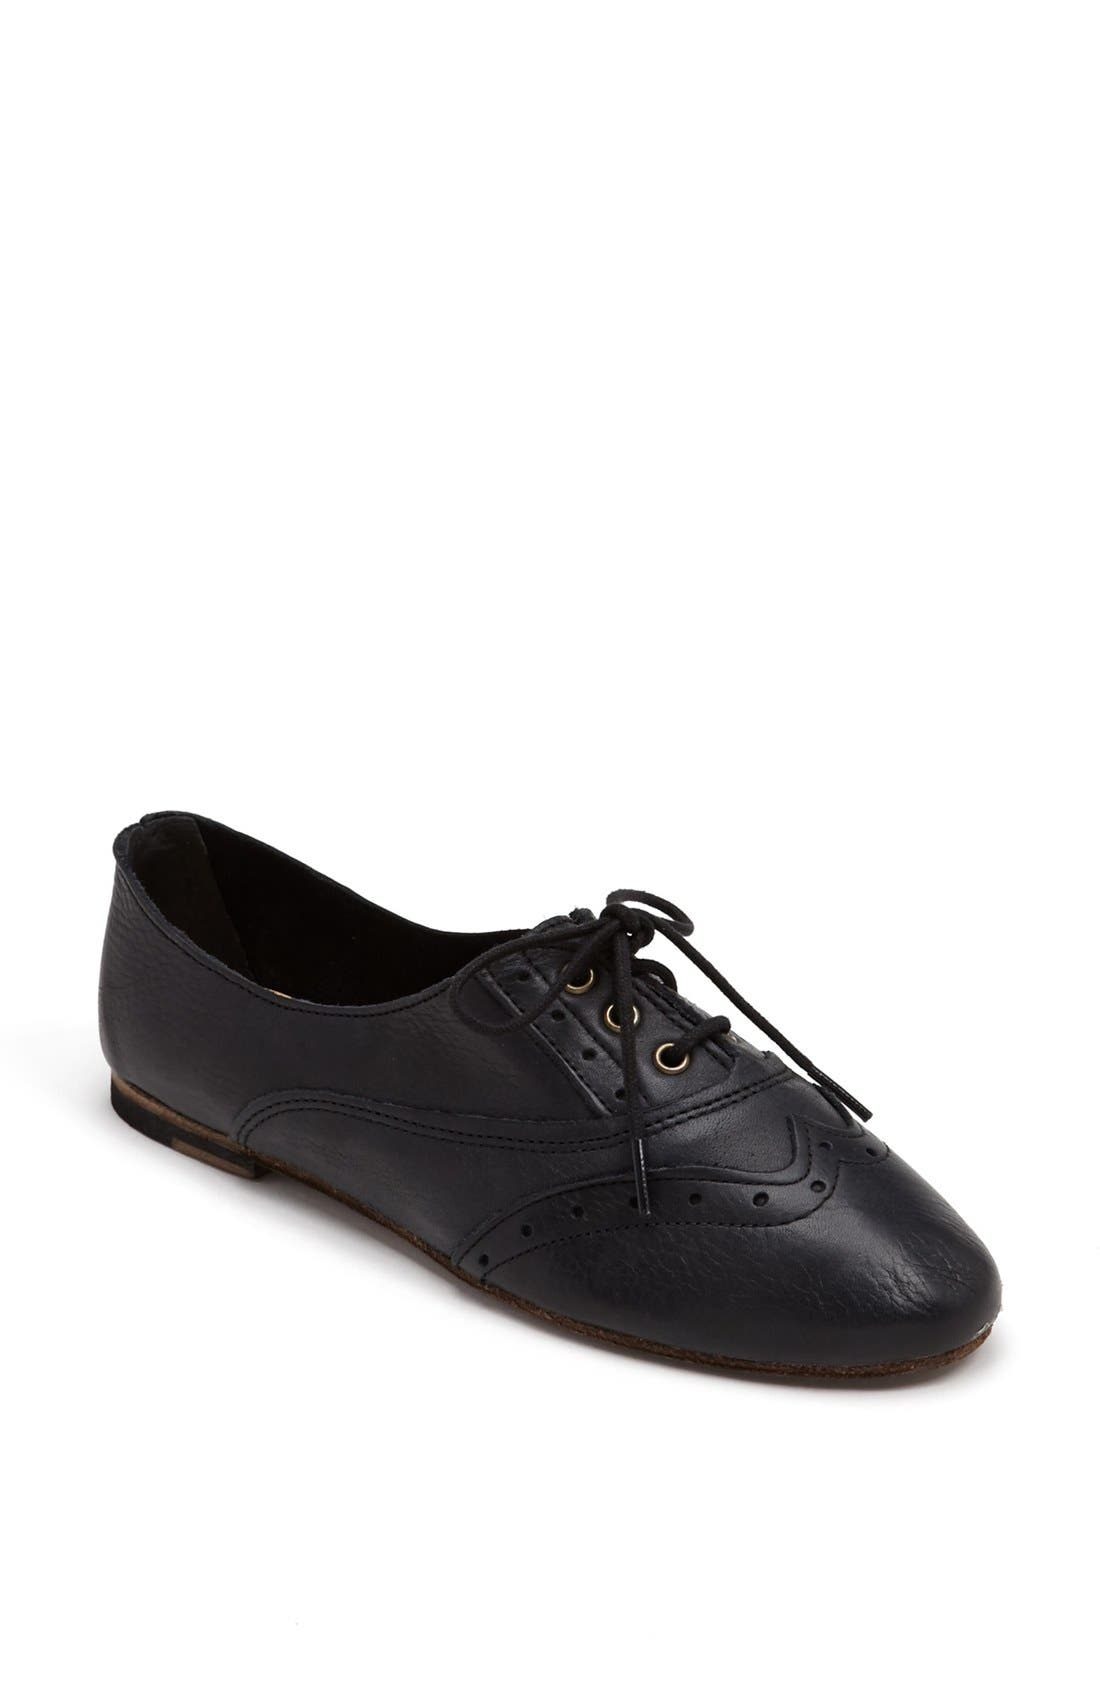 Alternate Image 1 Selected - Vintage Shoe Company 'Aubrey' Flat